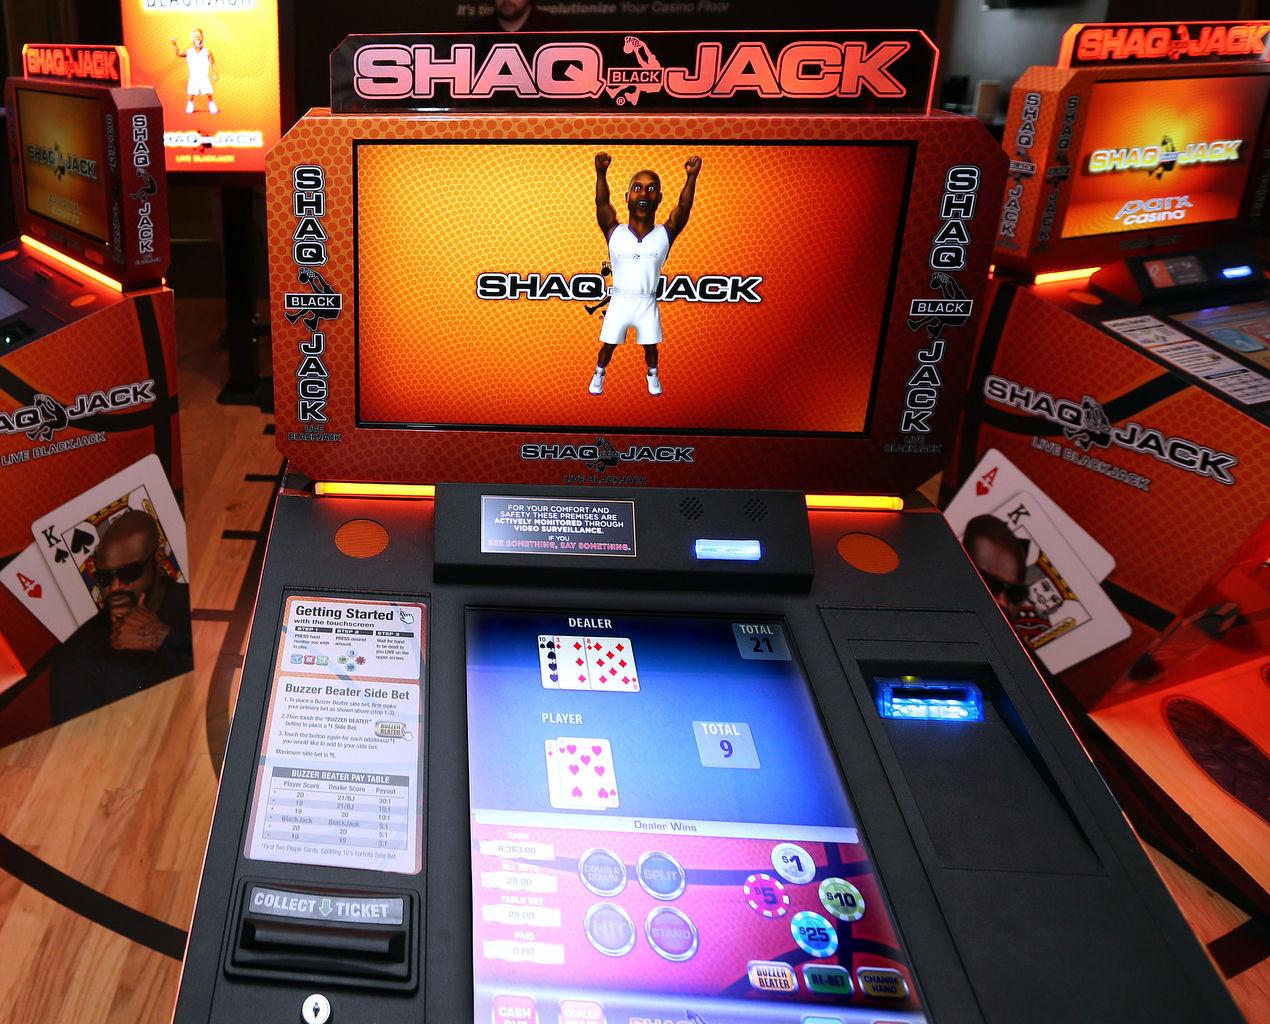 Black casino jack link startup.com tables.html gold coast hotel and casino, las vegas, nv